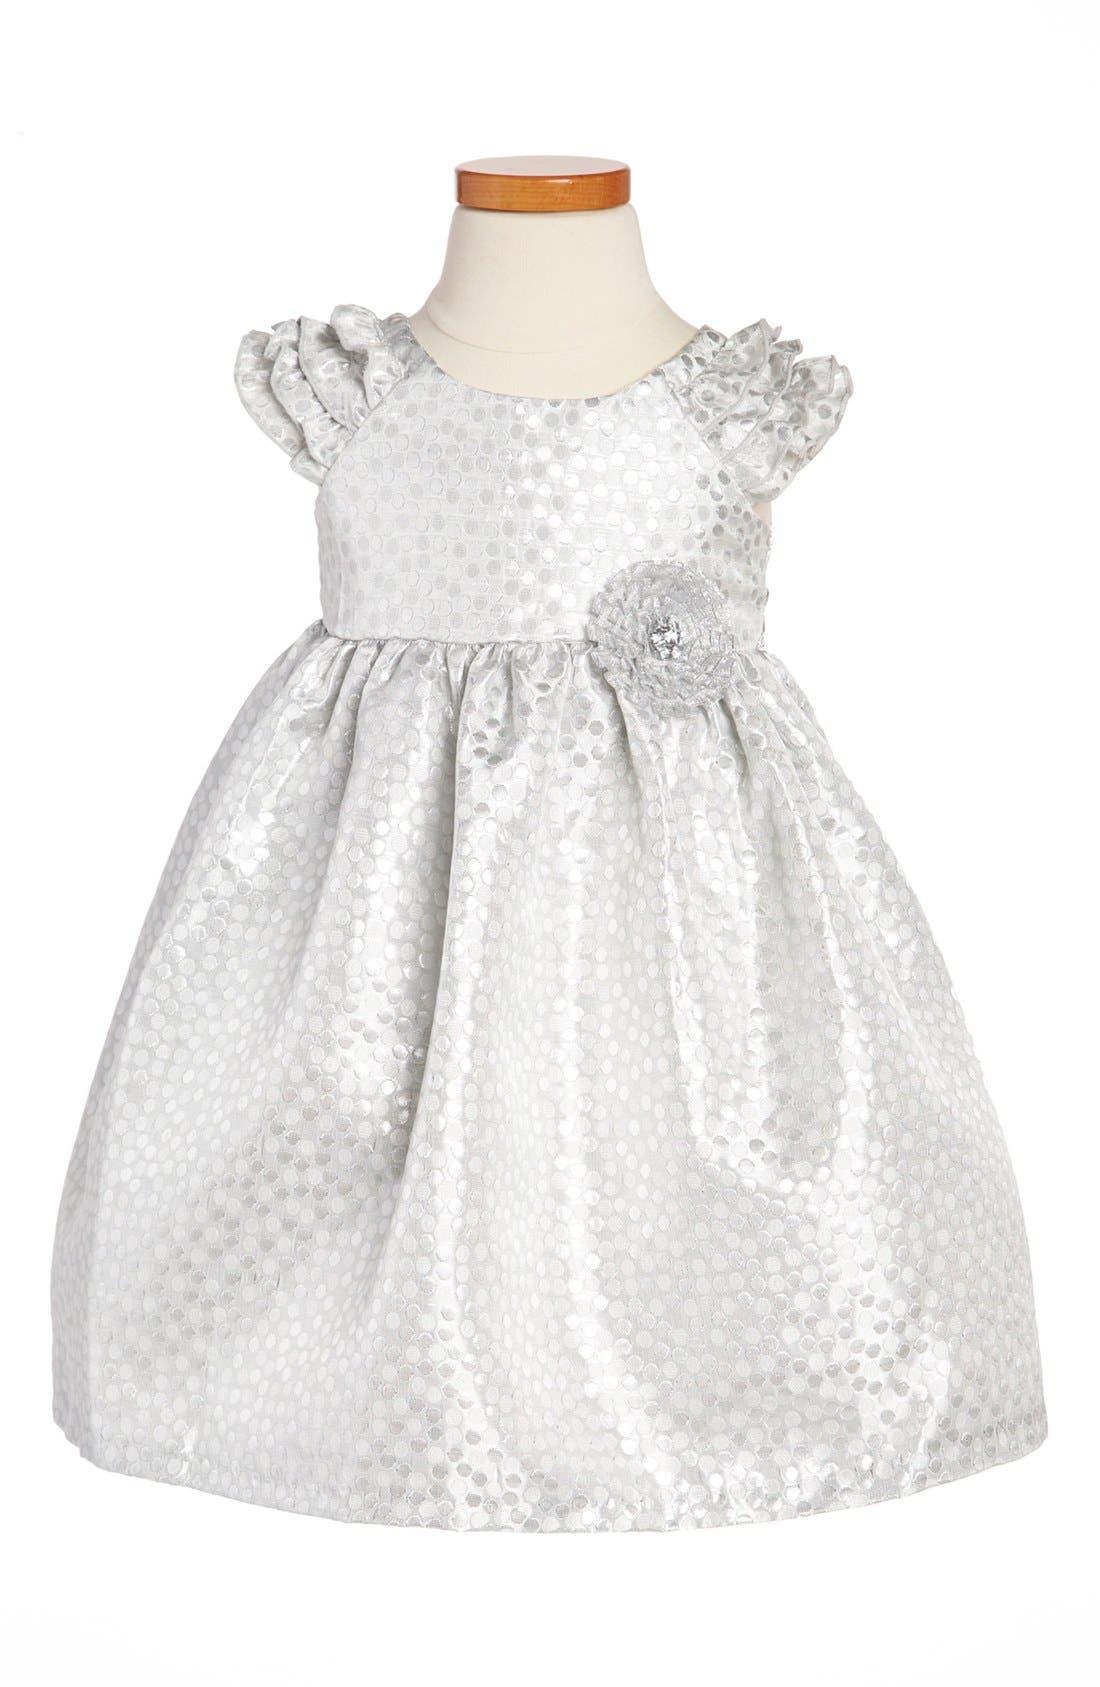 Main Image - Laura Ashley Brocade Dress (Toddler Girls)